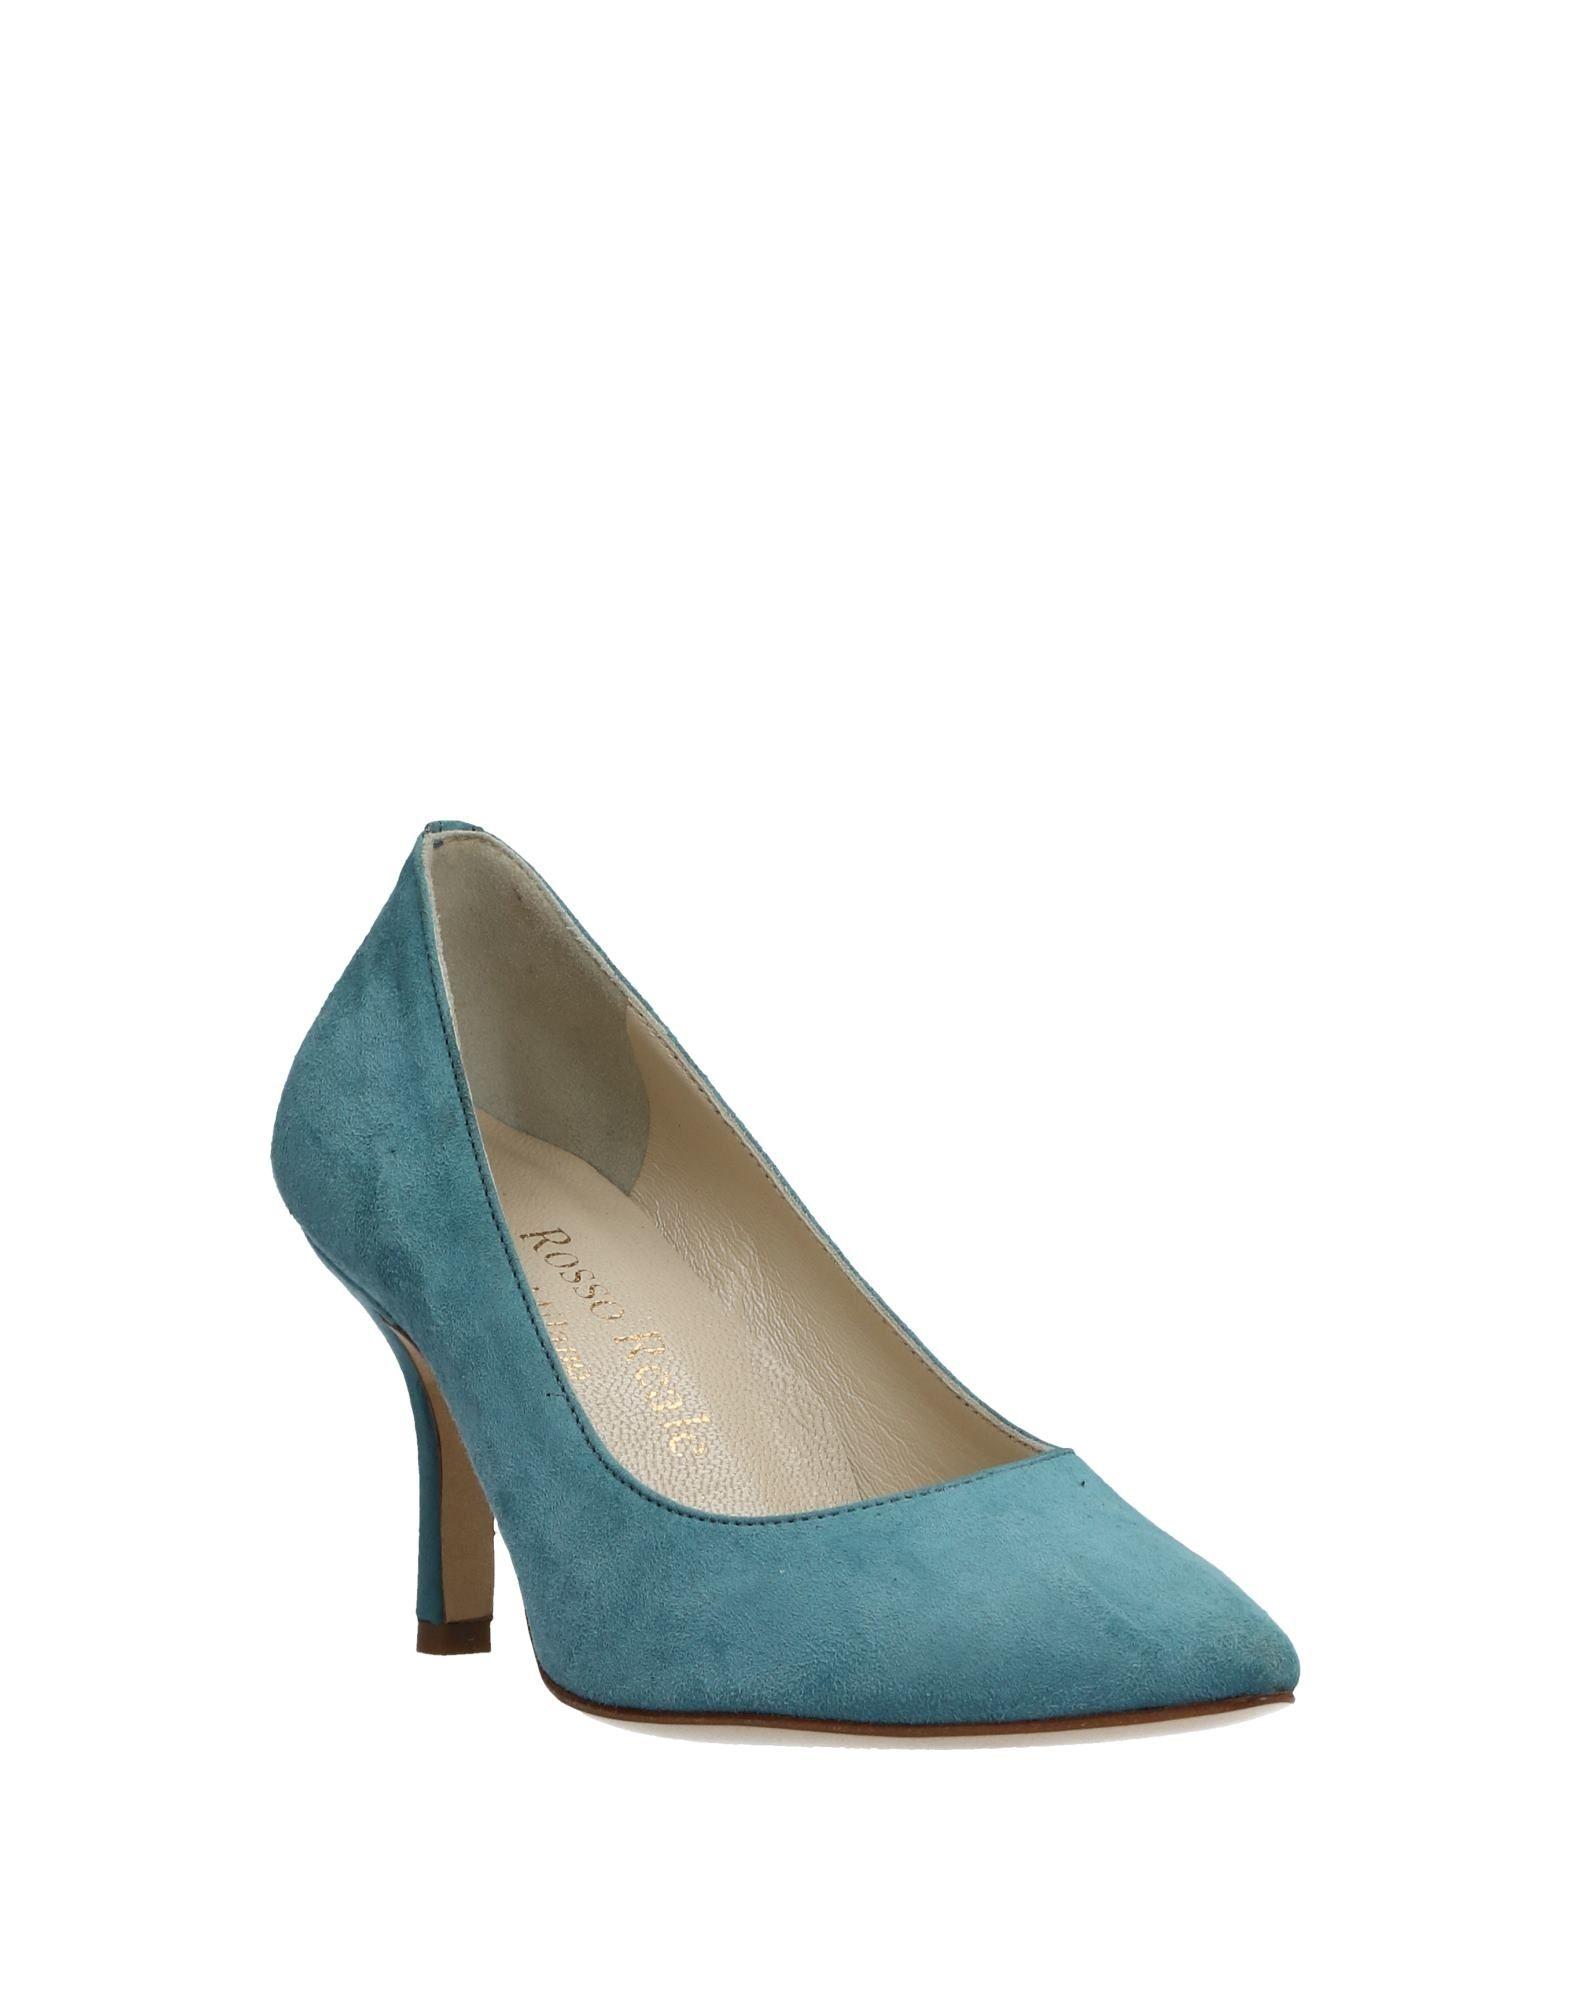 Rosso Reale Pumps Damen beliebte  11525133QA Gute Qualität beliebte Damen Schuhe 9f0f5b